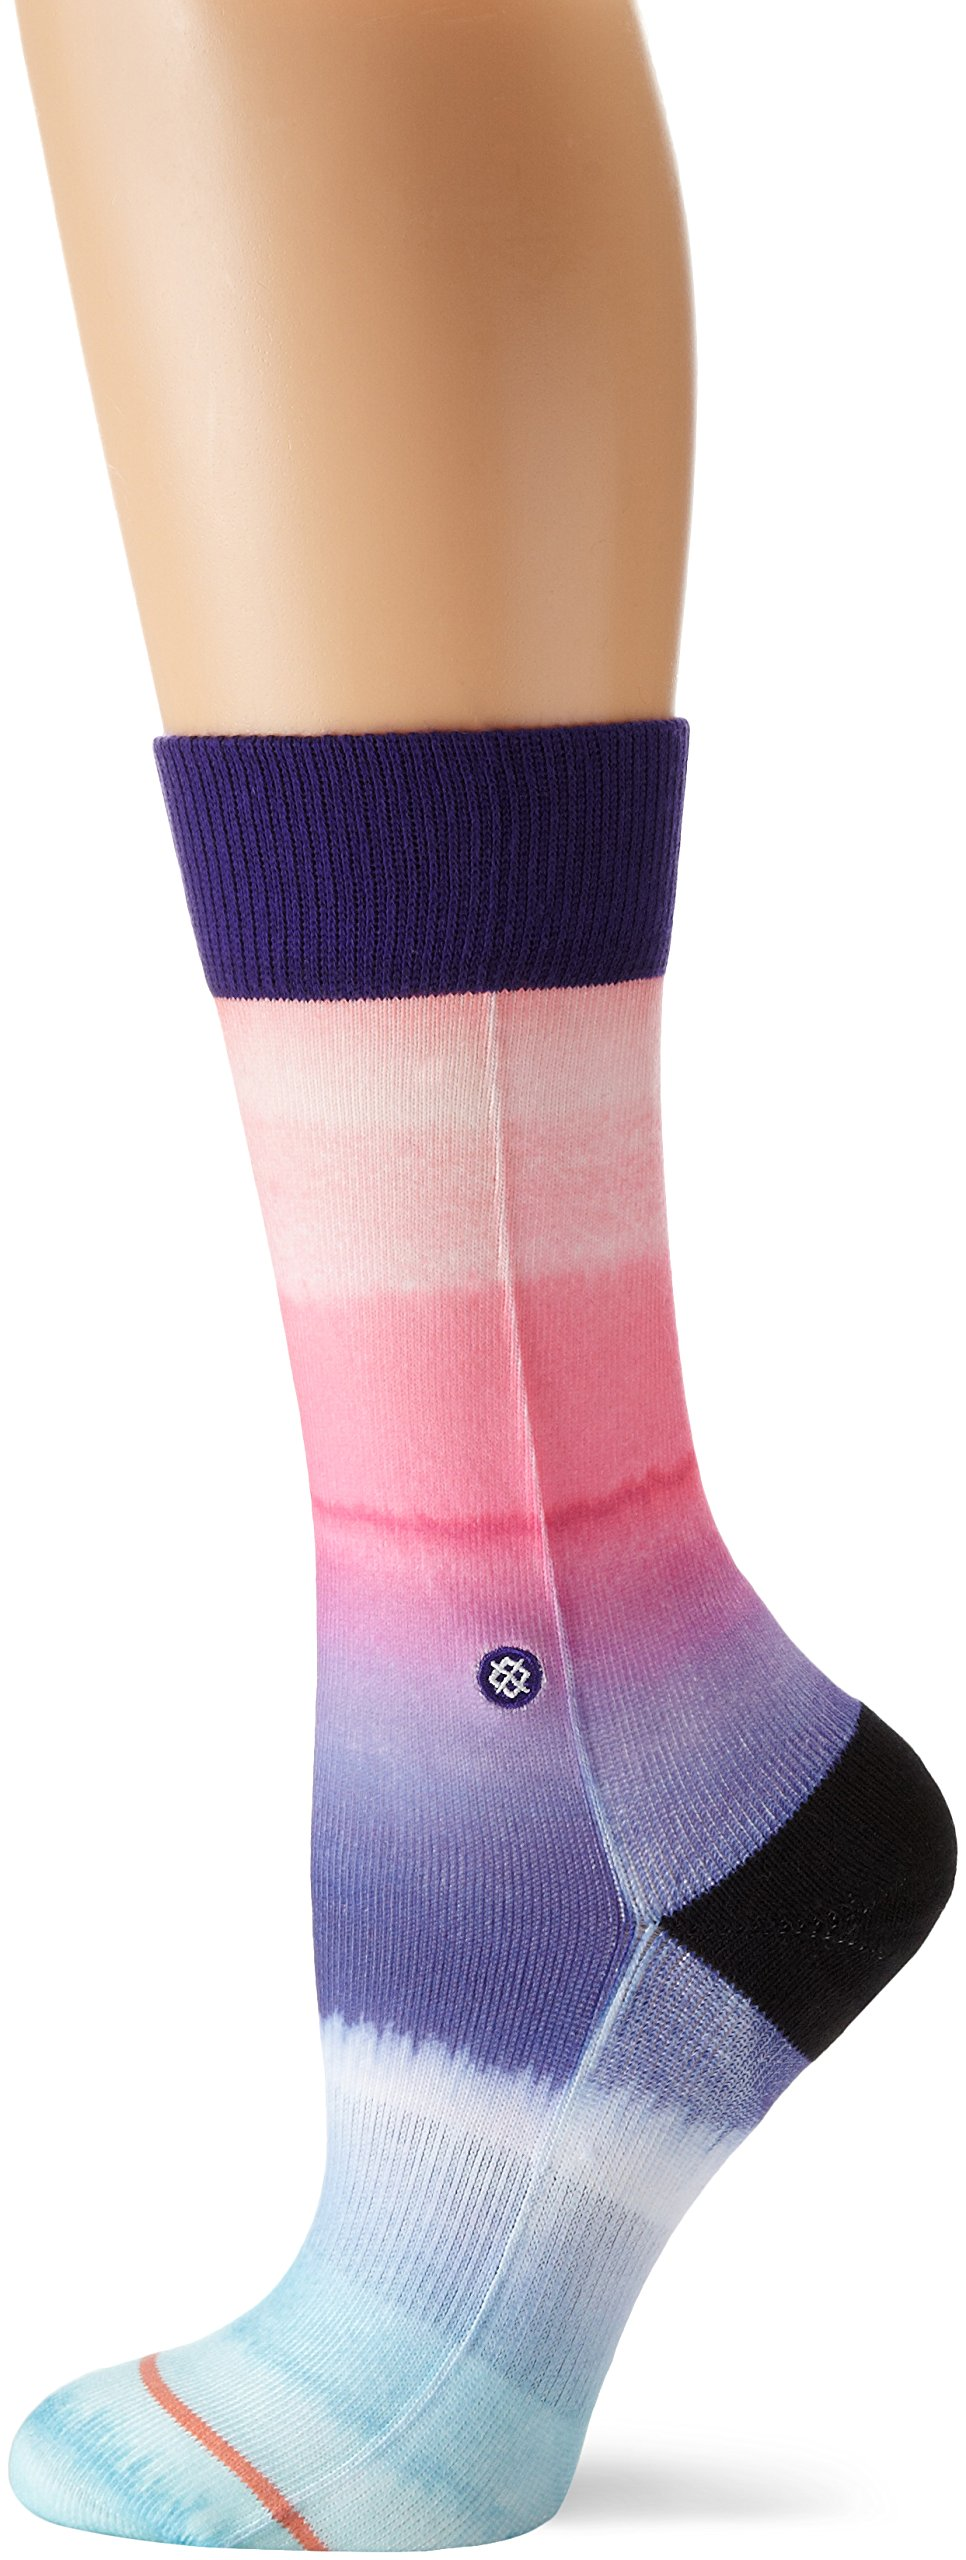 Stance Women's Tomboy Crew Sock